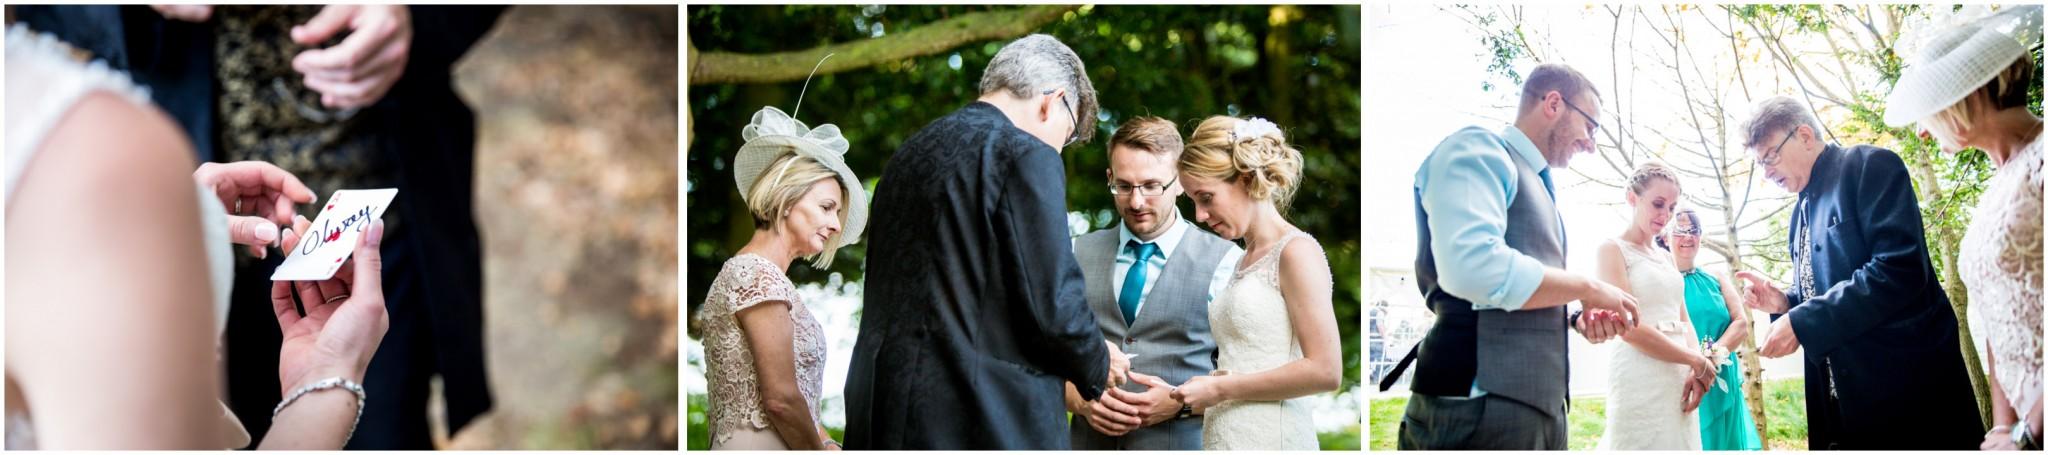 Tournerbury Woods Estate Wedding Guest admiring wedding rings